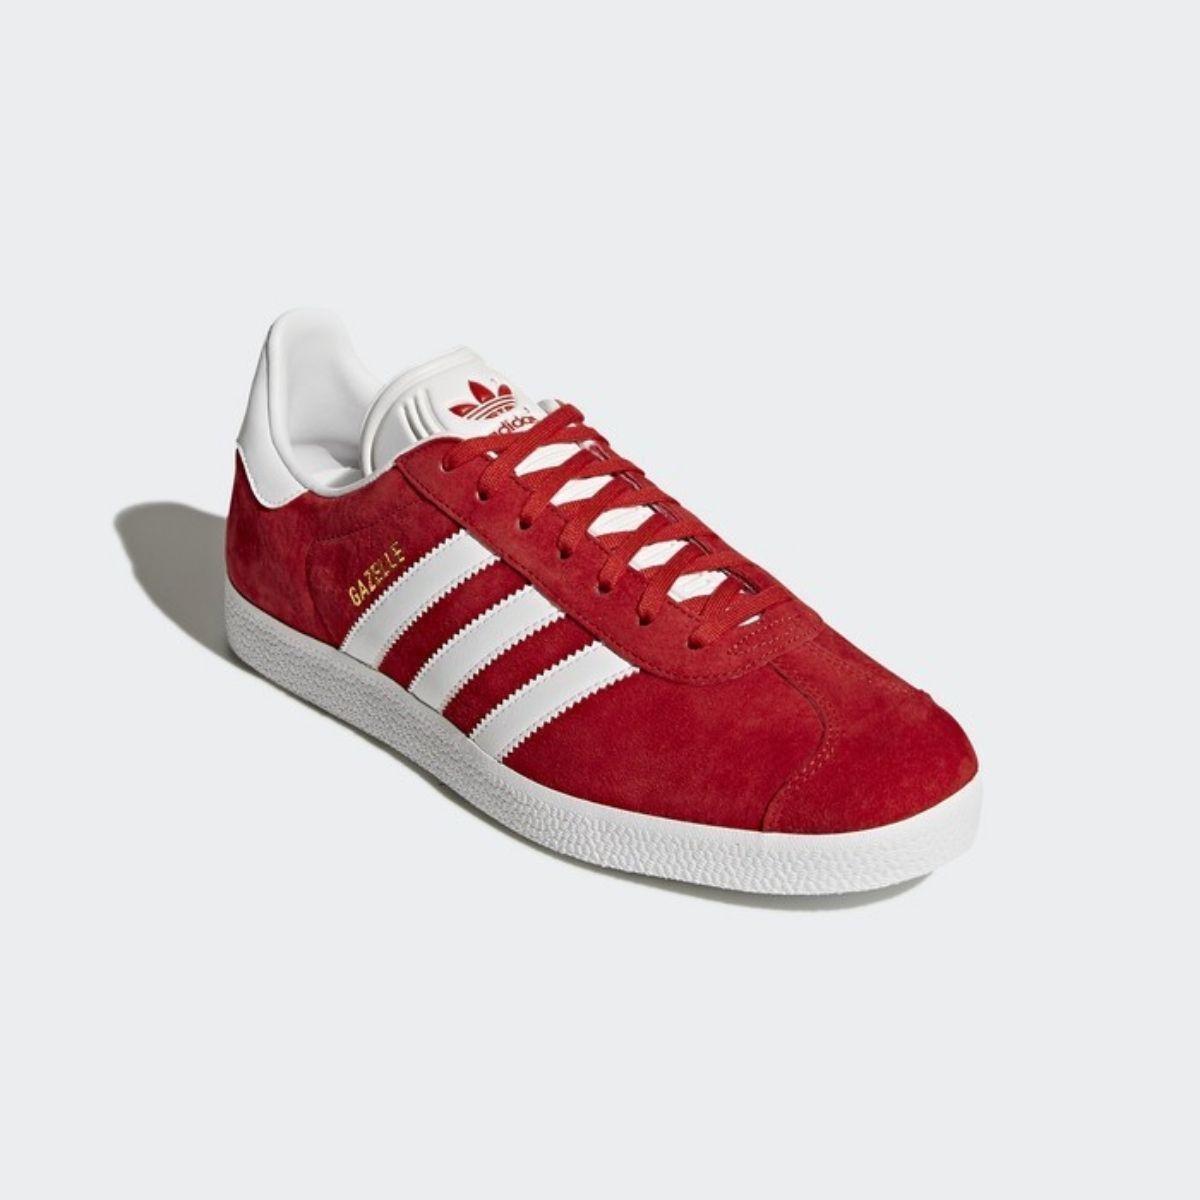 Scarpa Adidas Gazelle Rosso...